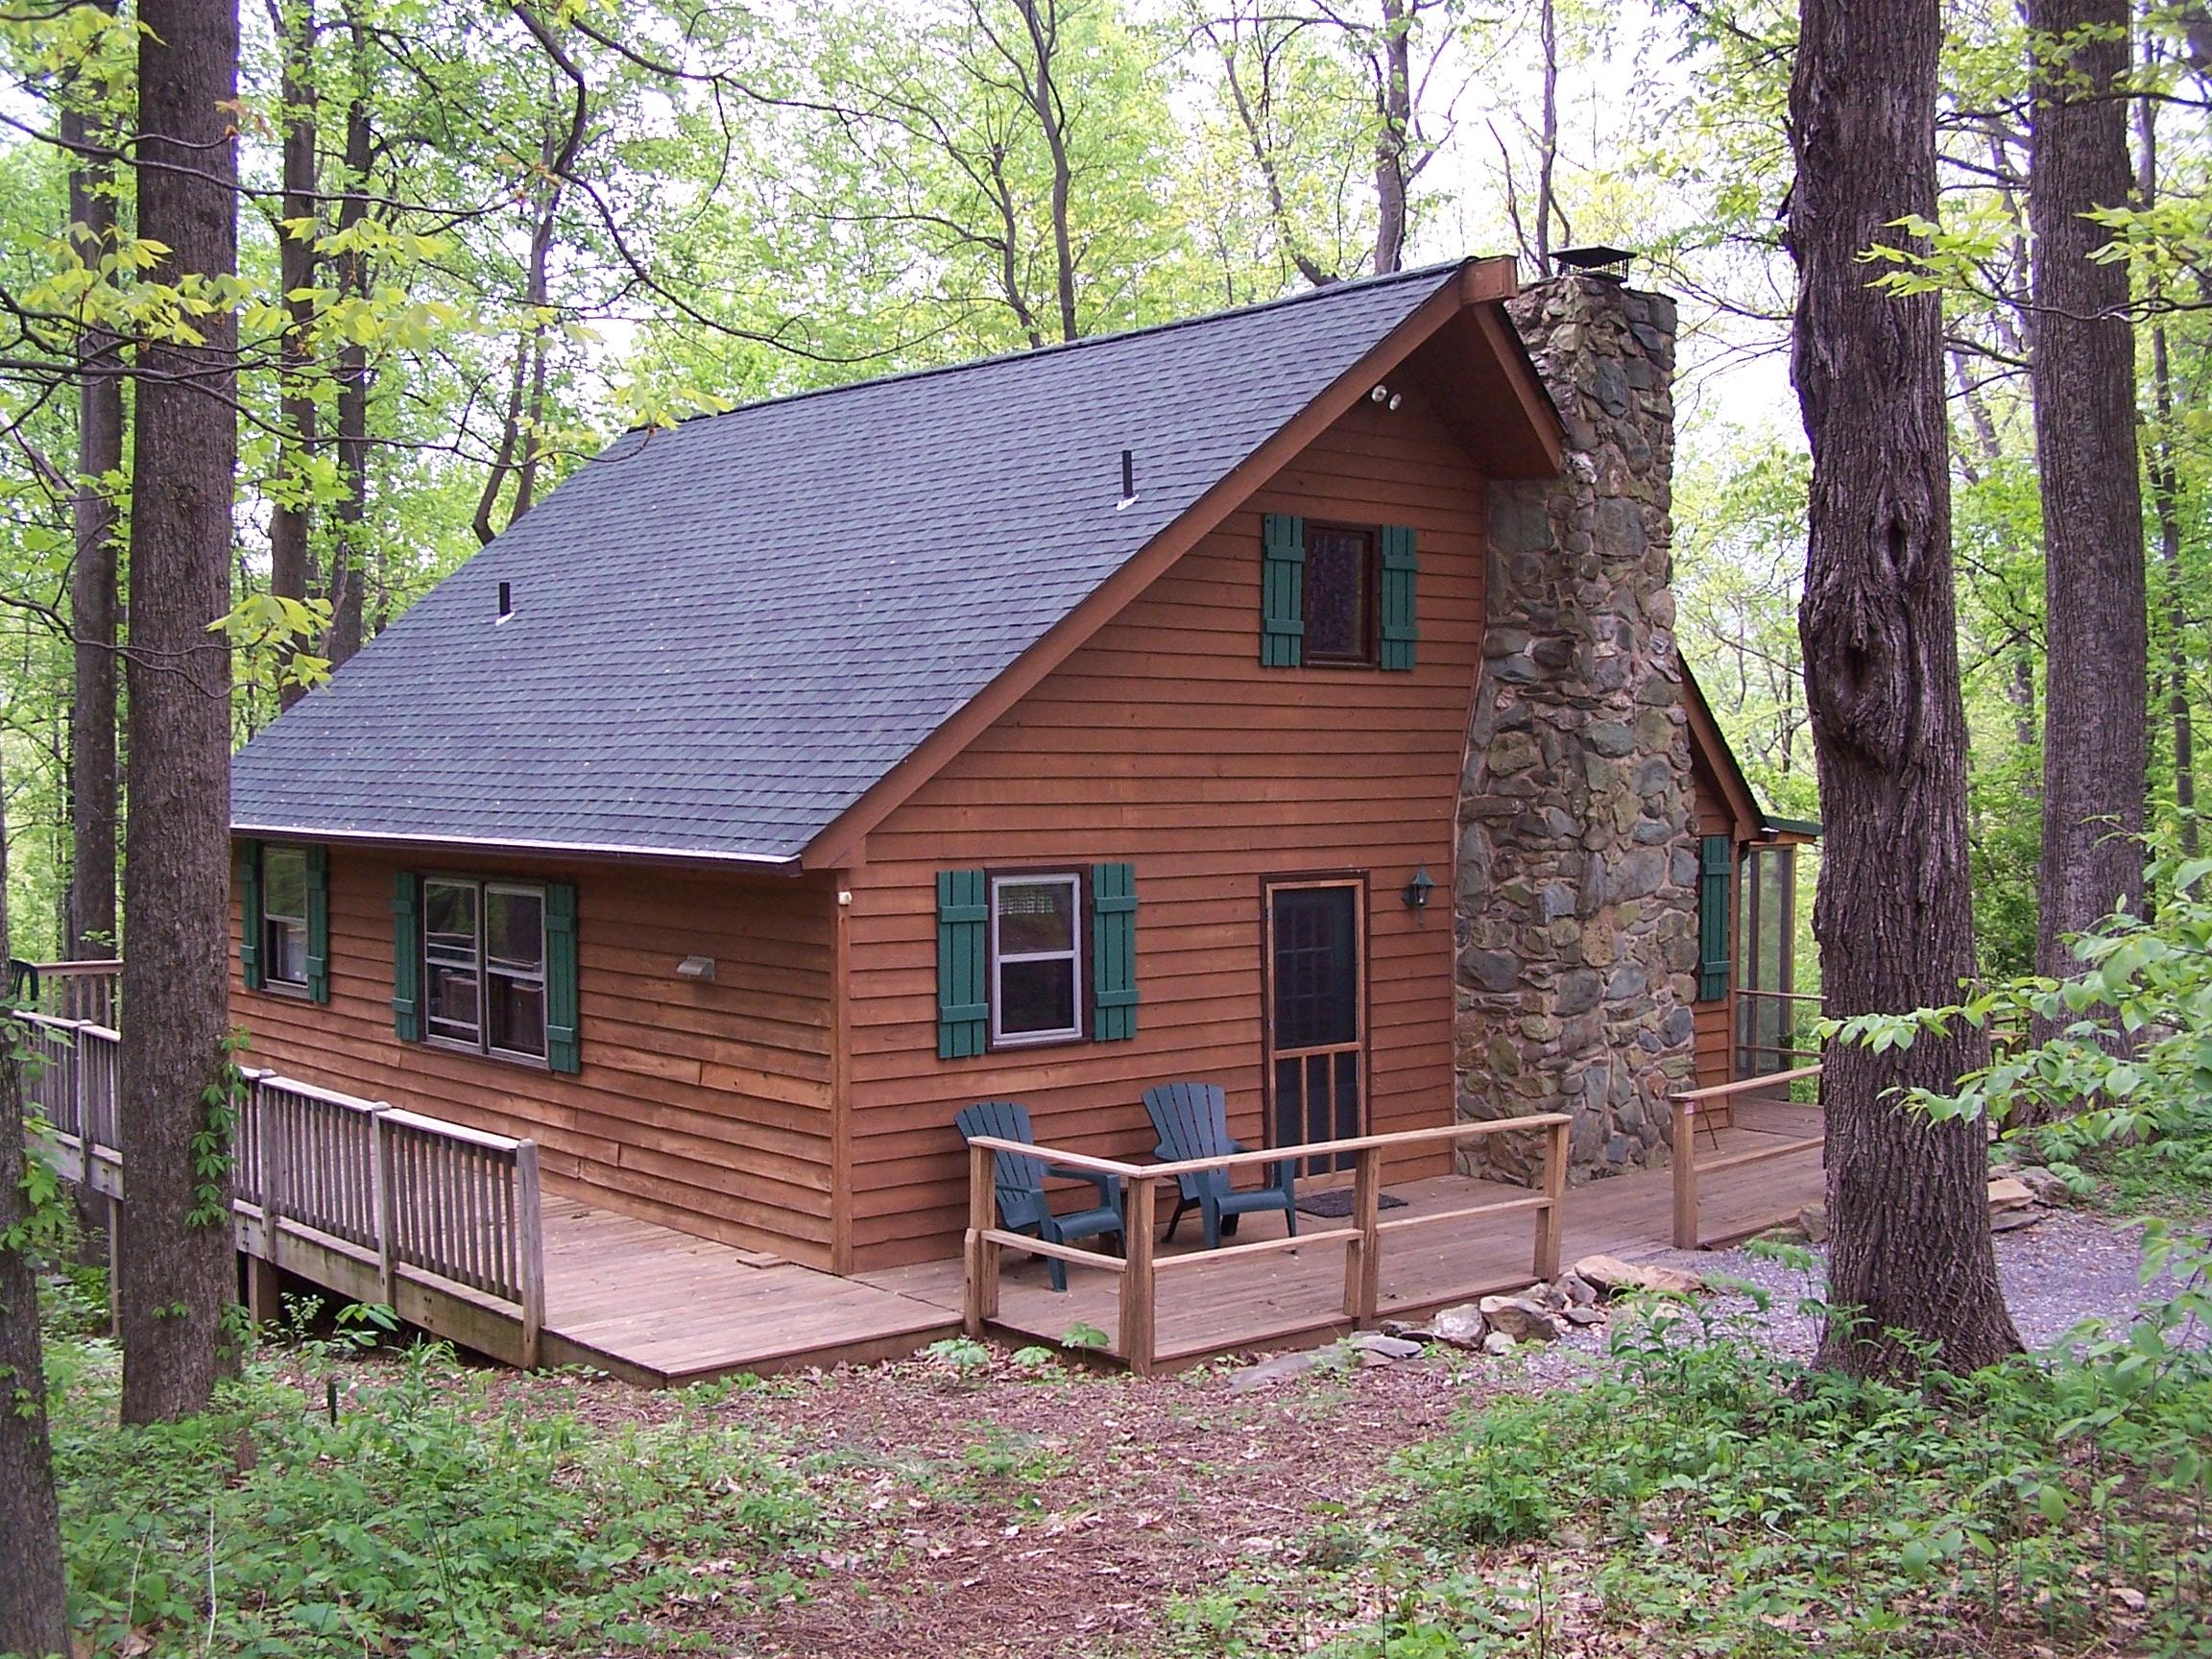 cabins forge galax ga cabin pet tn in creek rentals chestnut galena log sevierville gatlinburg il friendly va s pigeon